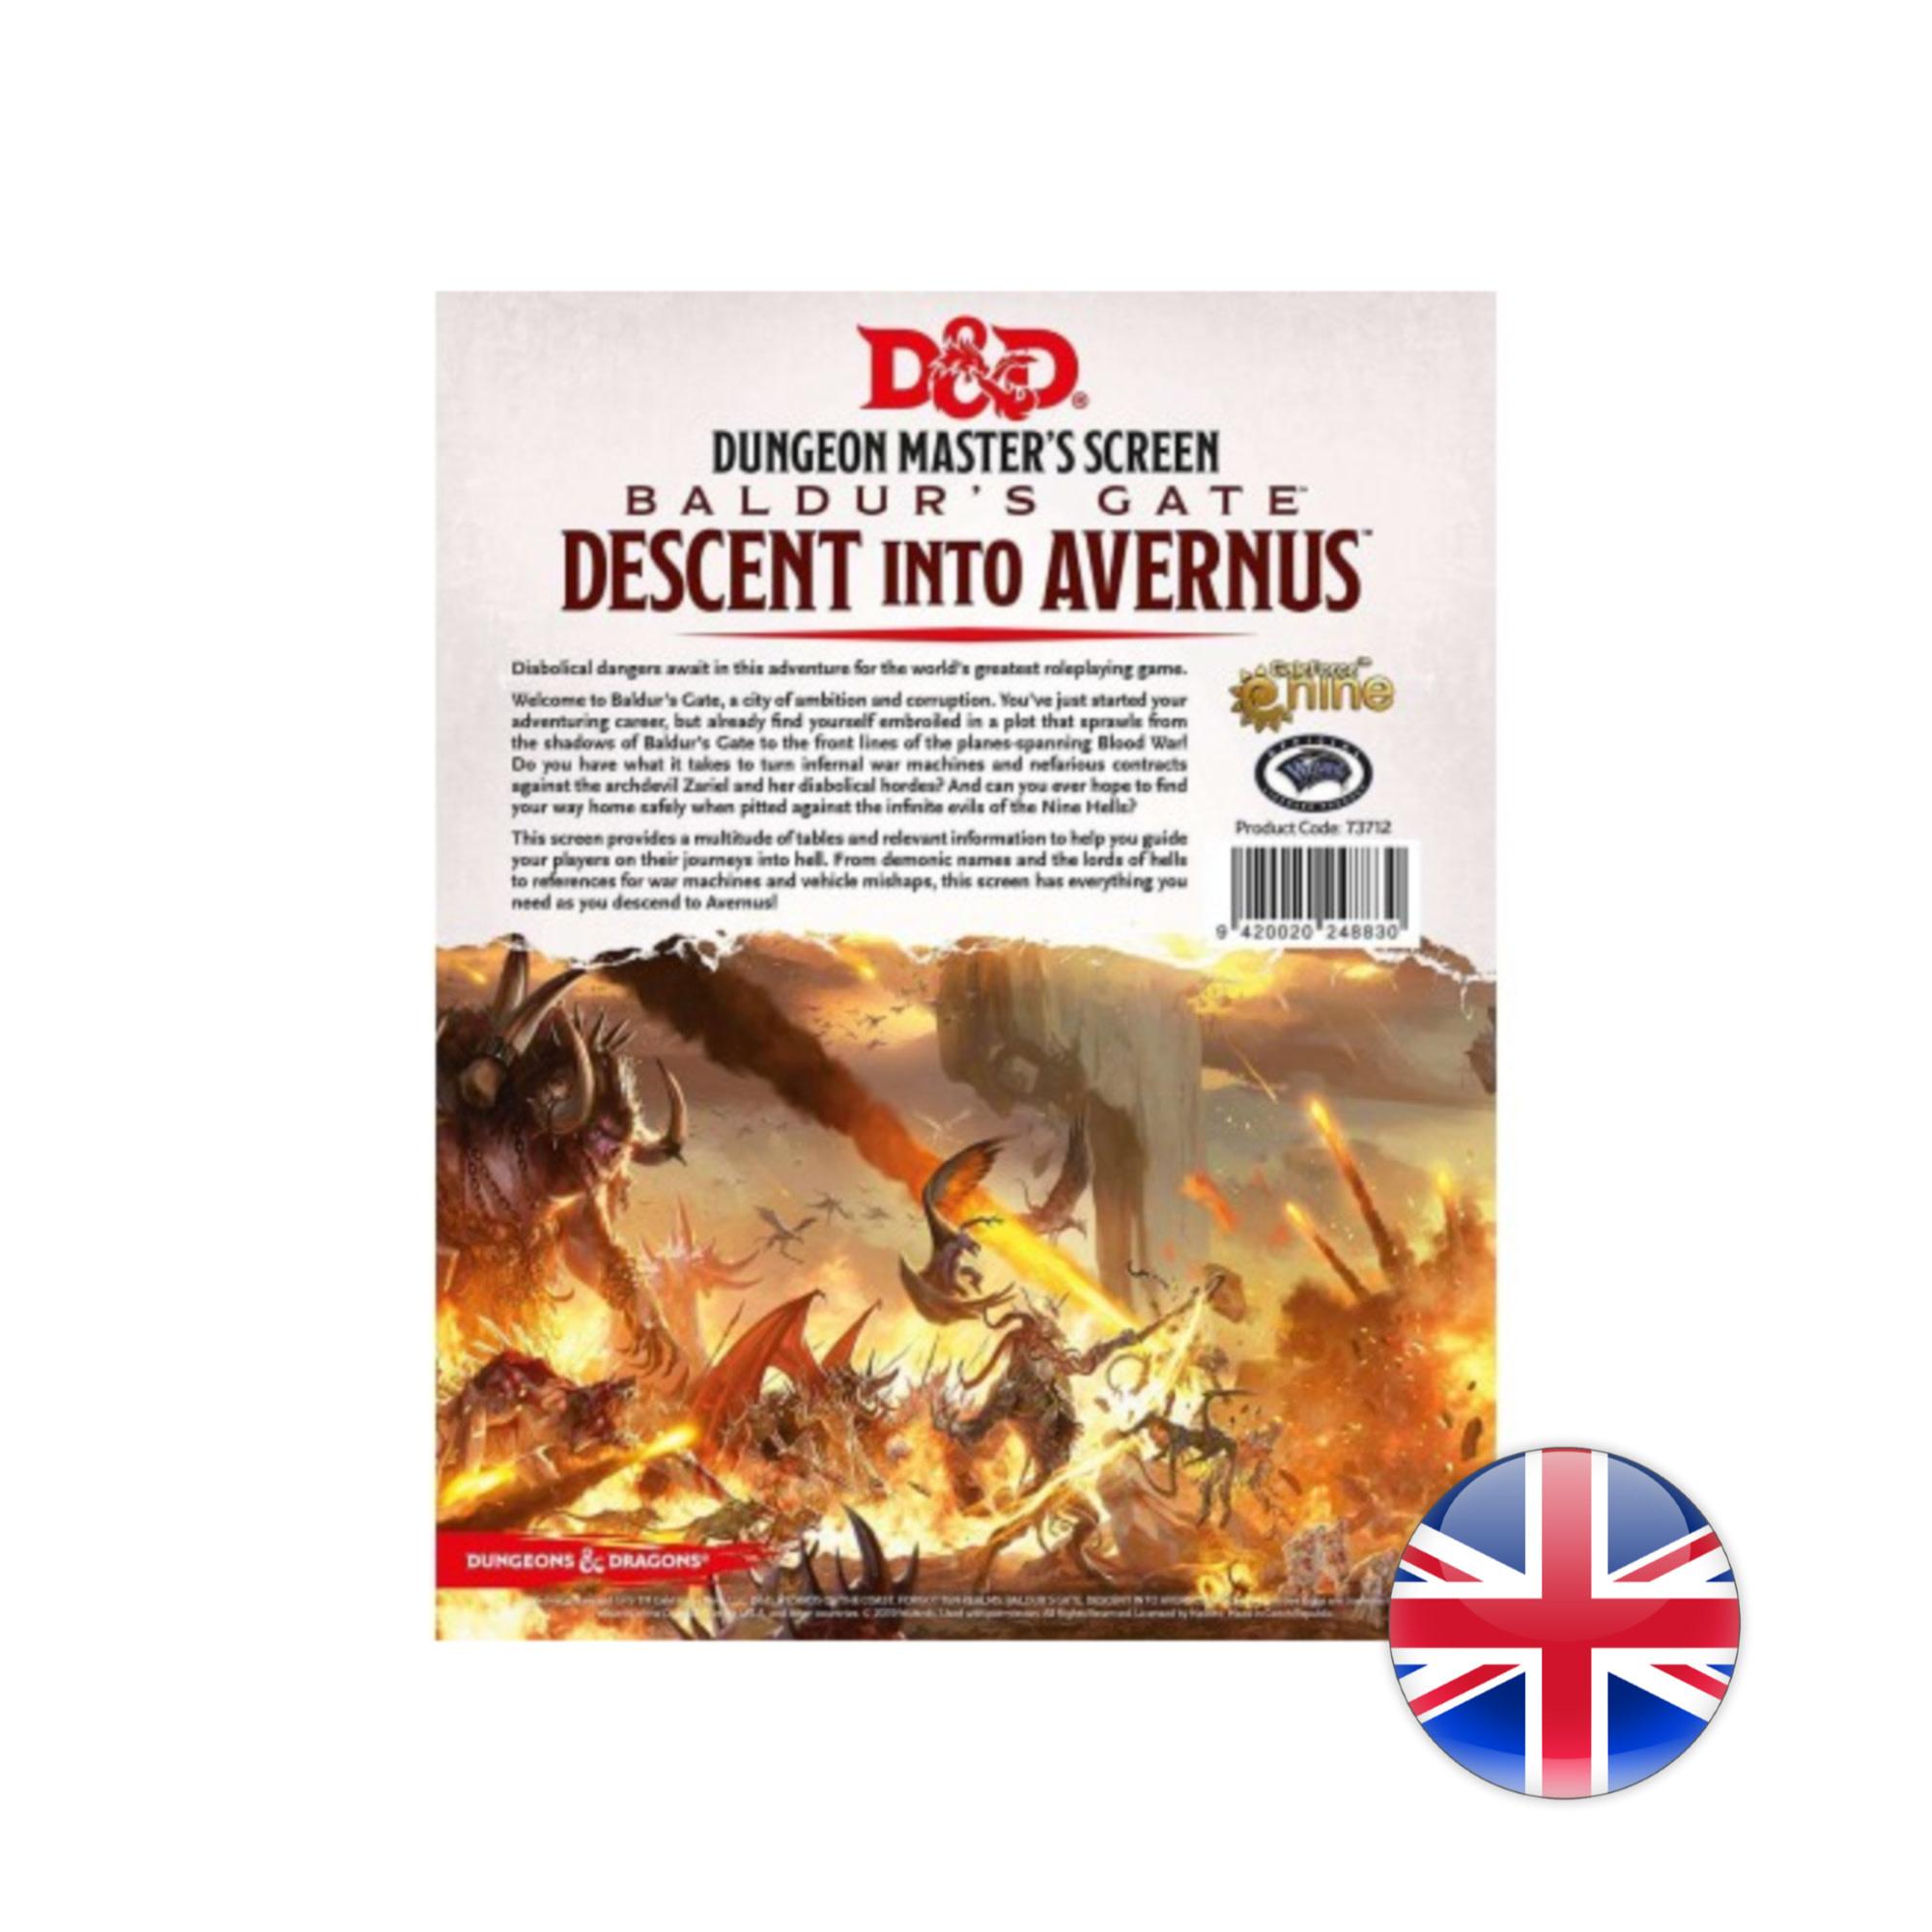 D&D: Baldurs Gate: Descent Into Avernus DM Screen